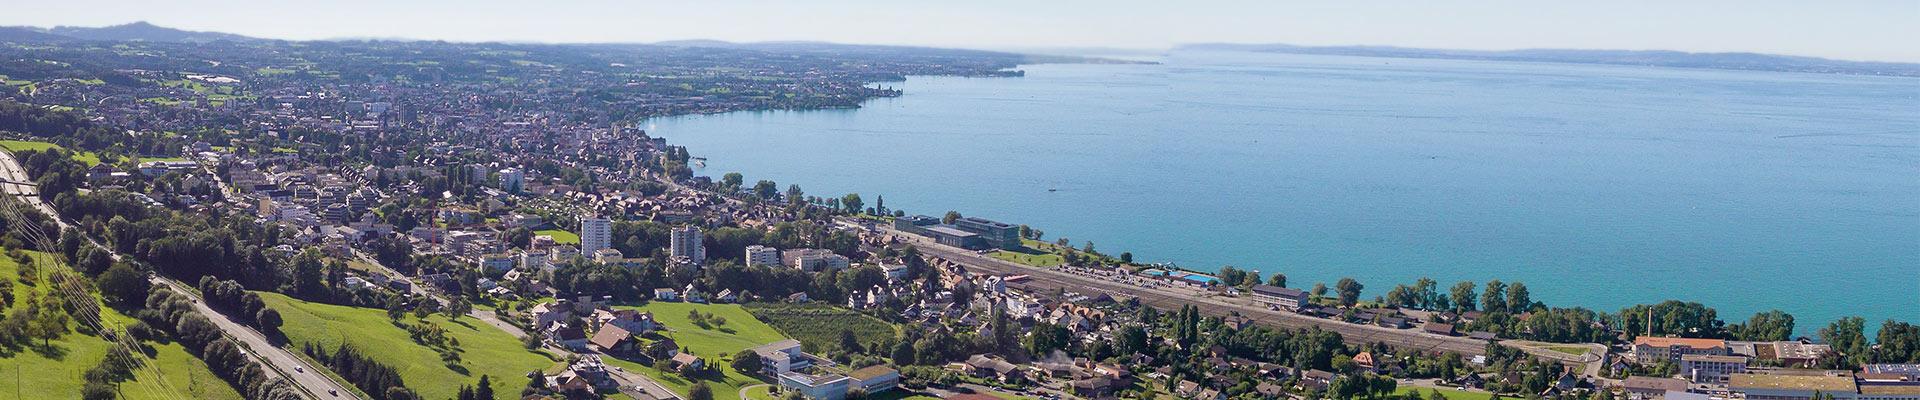 Mietobjekte Bodensee-Panorama